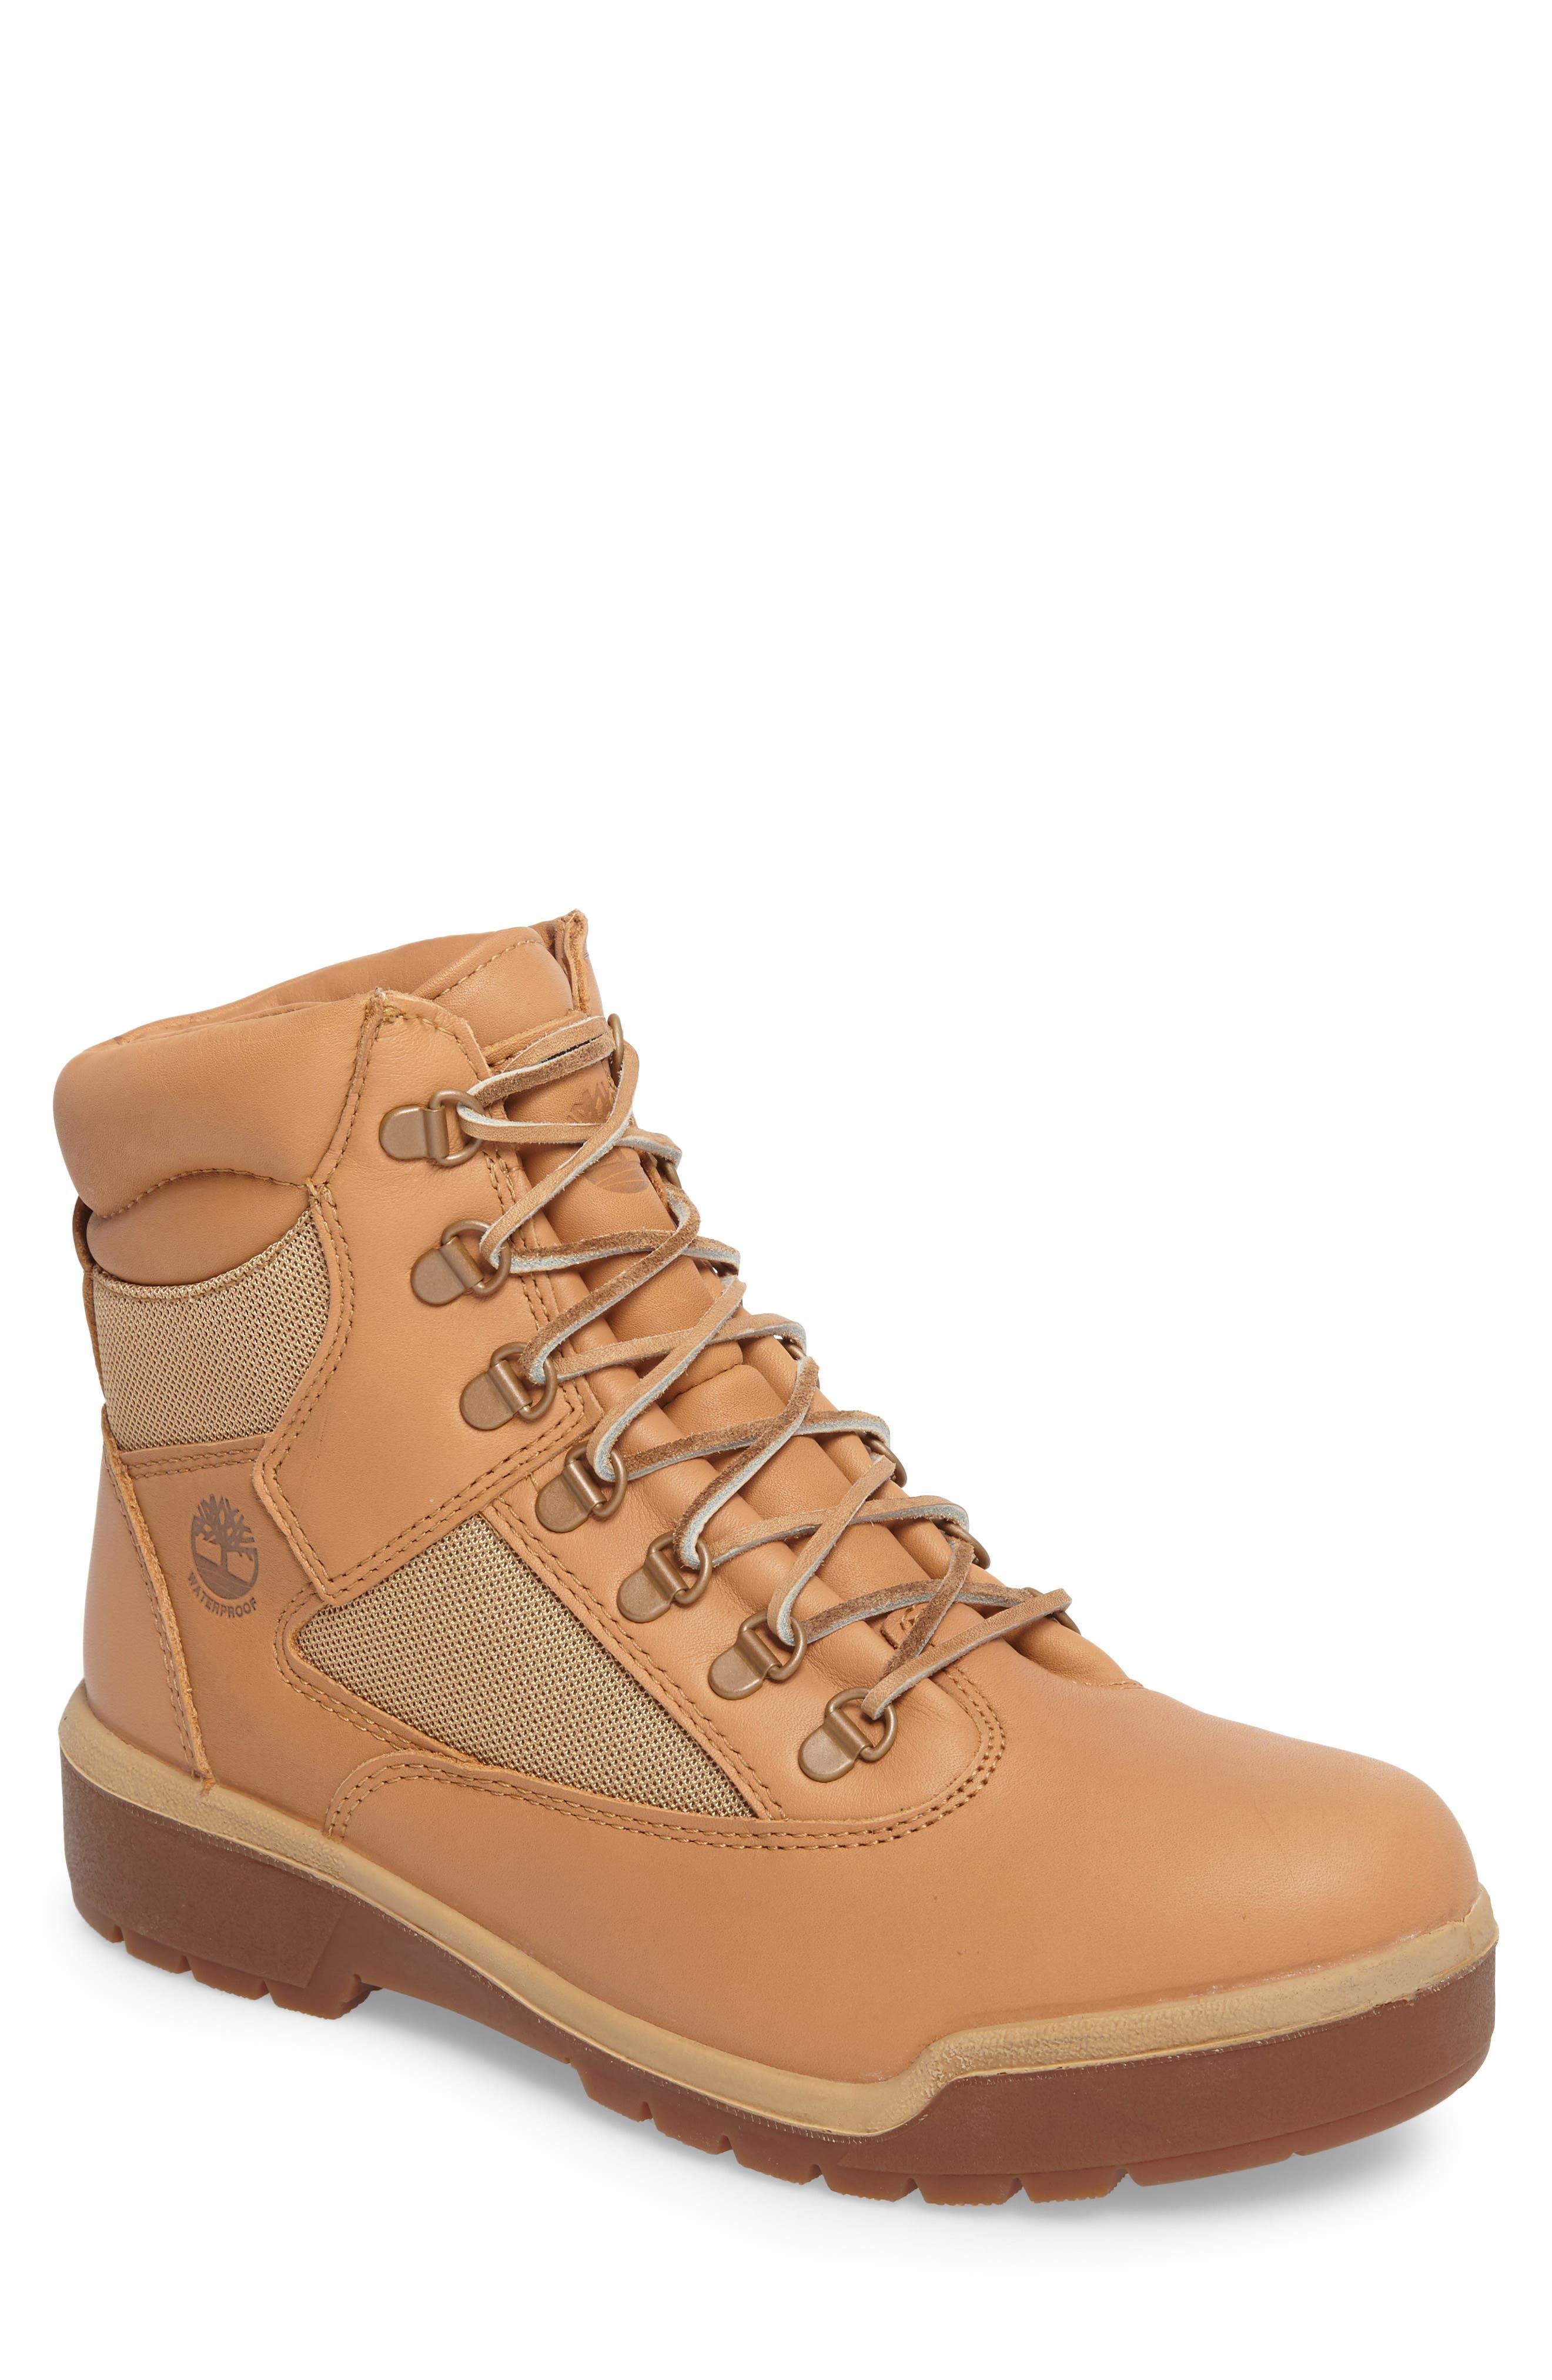 Timberland Waterproof Boot (Men)